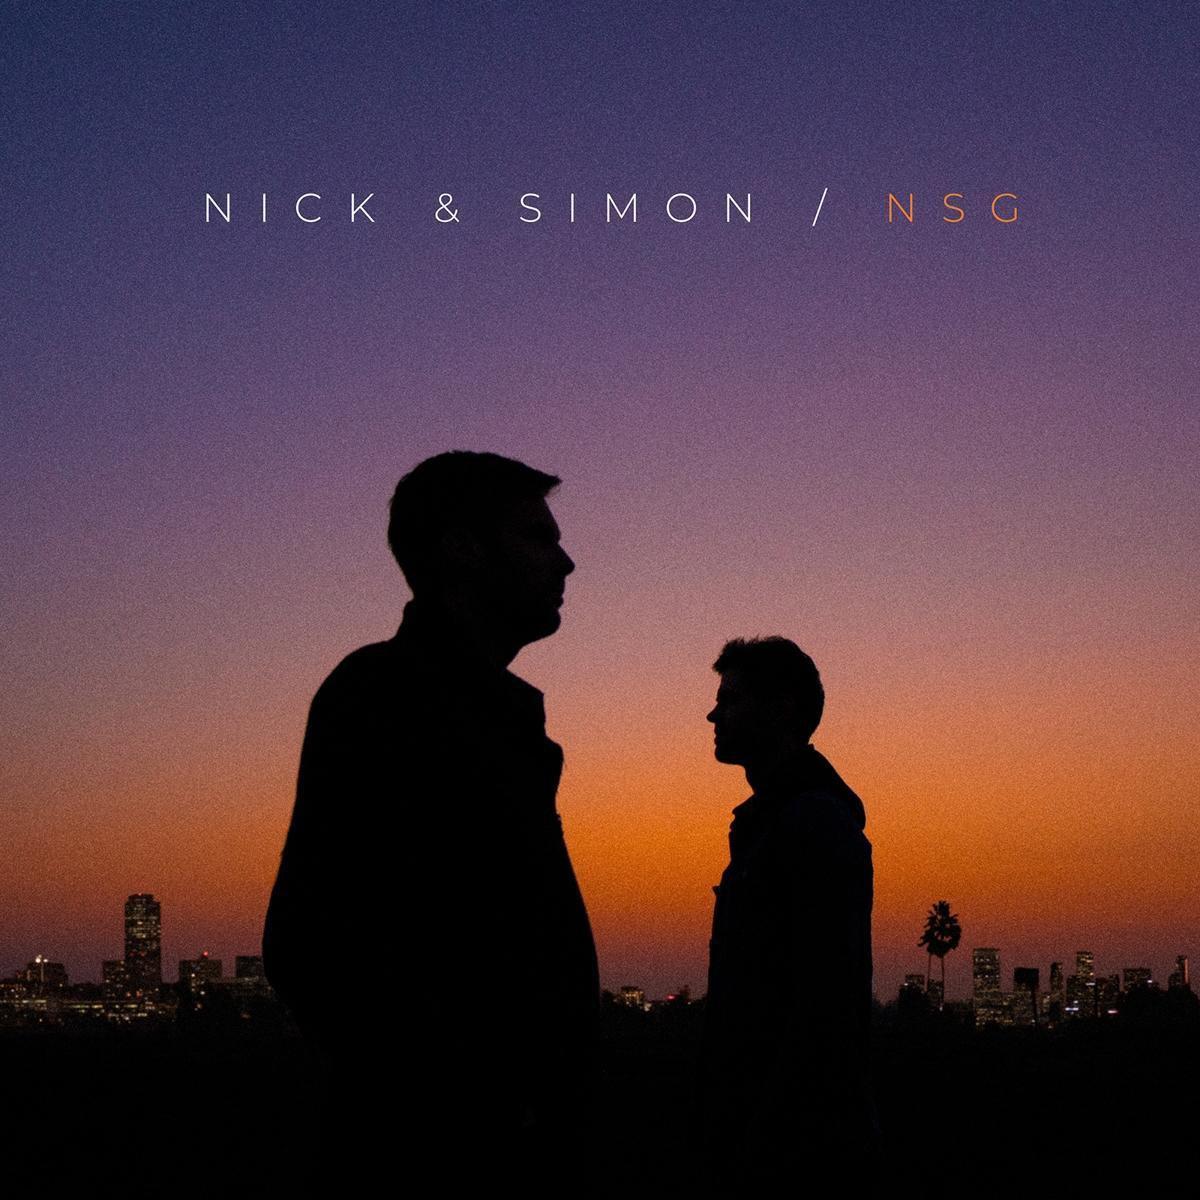 NSG (2CD) (Jewelcase) - Nick & Simon